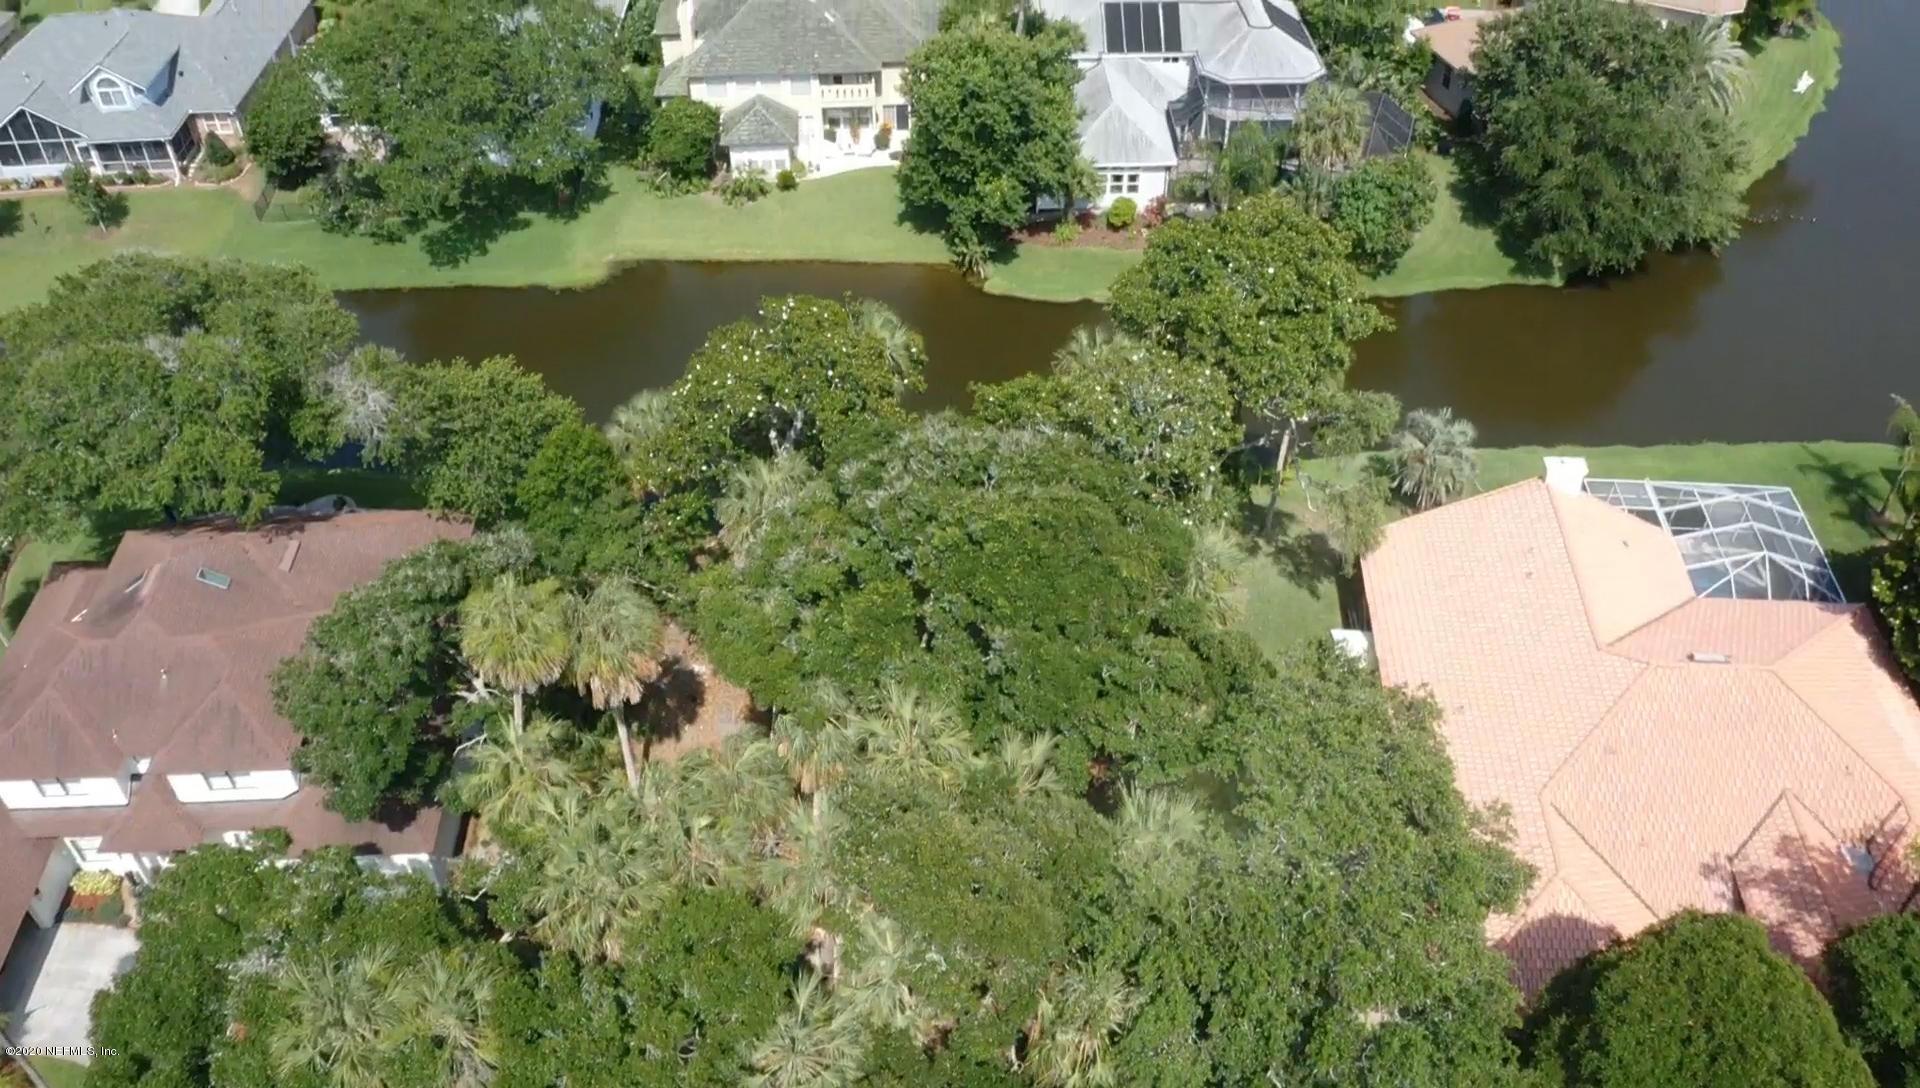 0 BEACHCOMBER, ATLANTIC BEACH, FLORIDA 32233, ,Vacant land,For sale,BEACHCOMBER,1056546